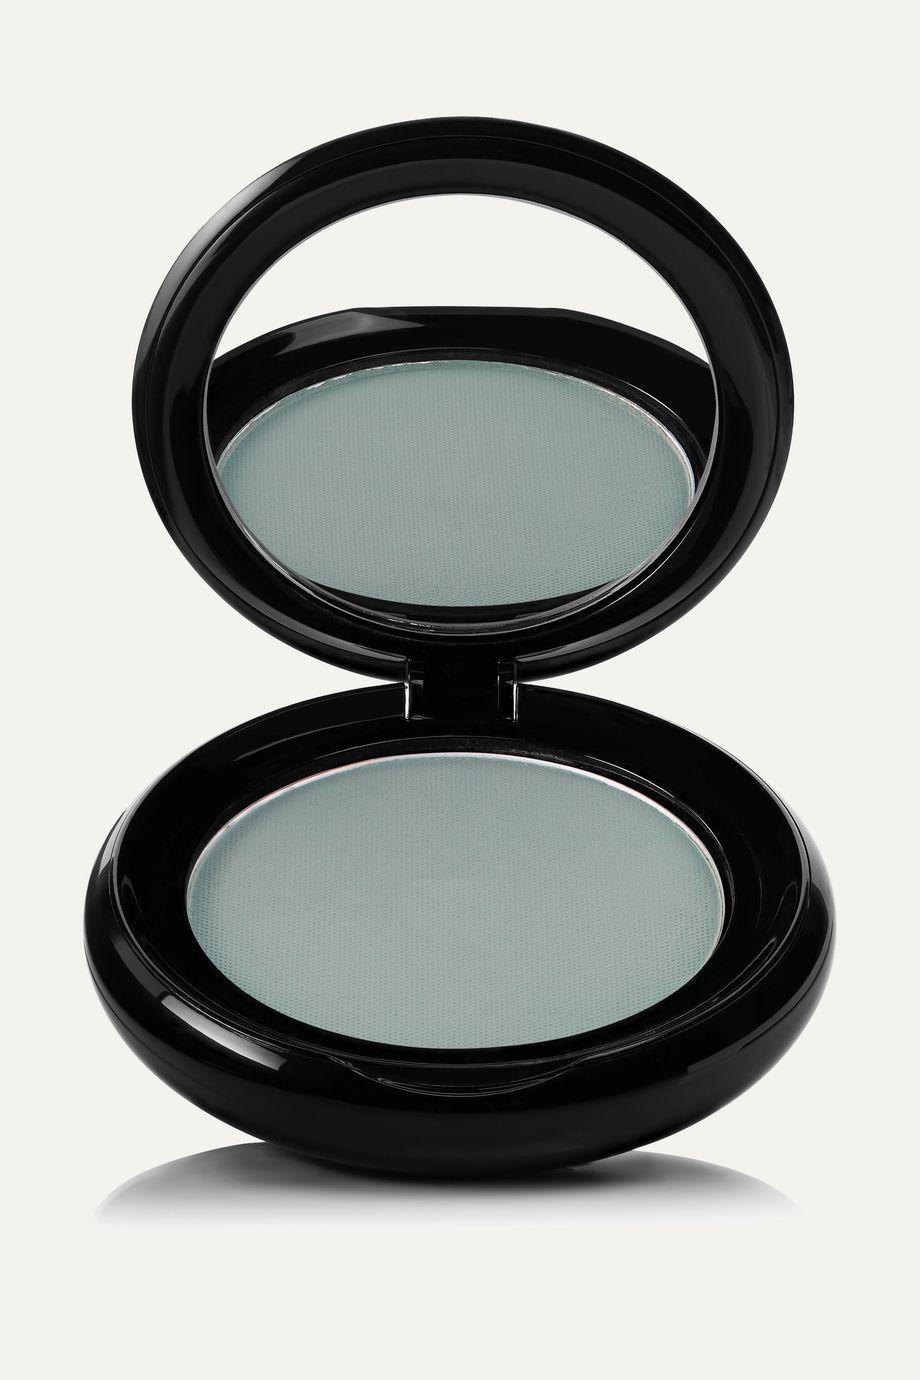 Marc Jacobs Beauty O!mega Shadow Gel Powder Eyeshadow - Smo!ke